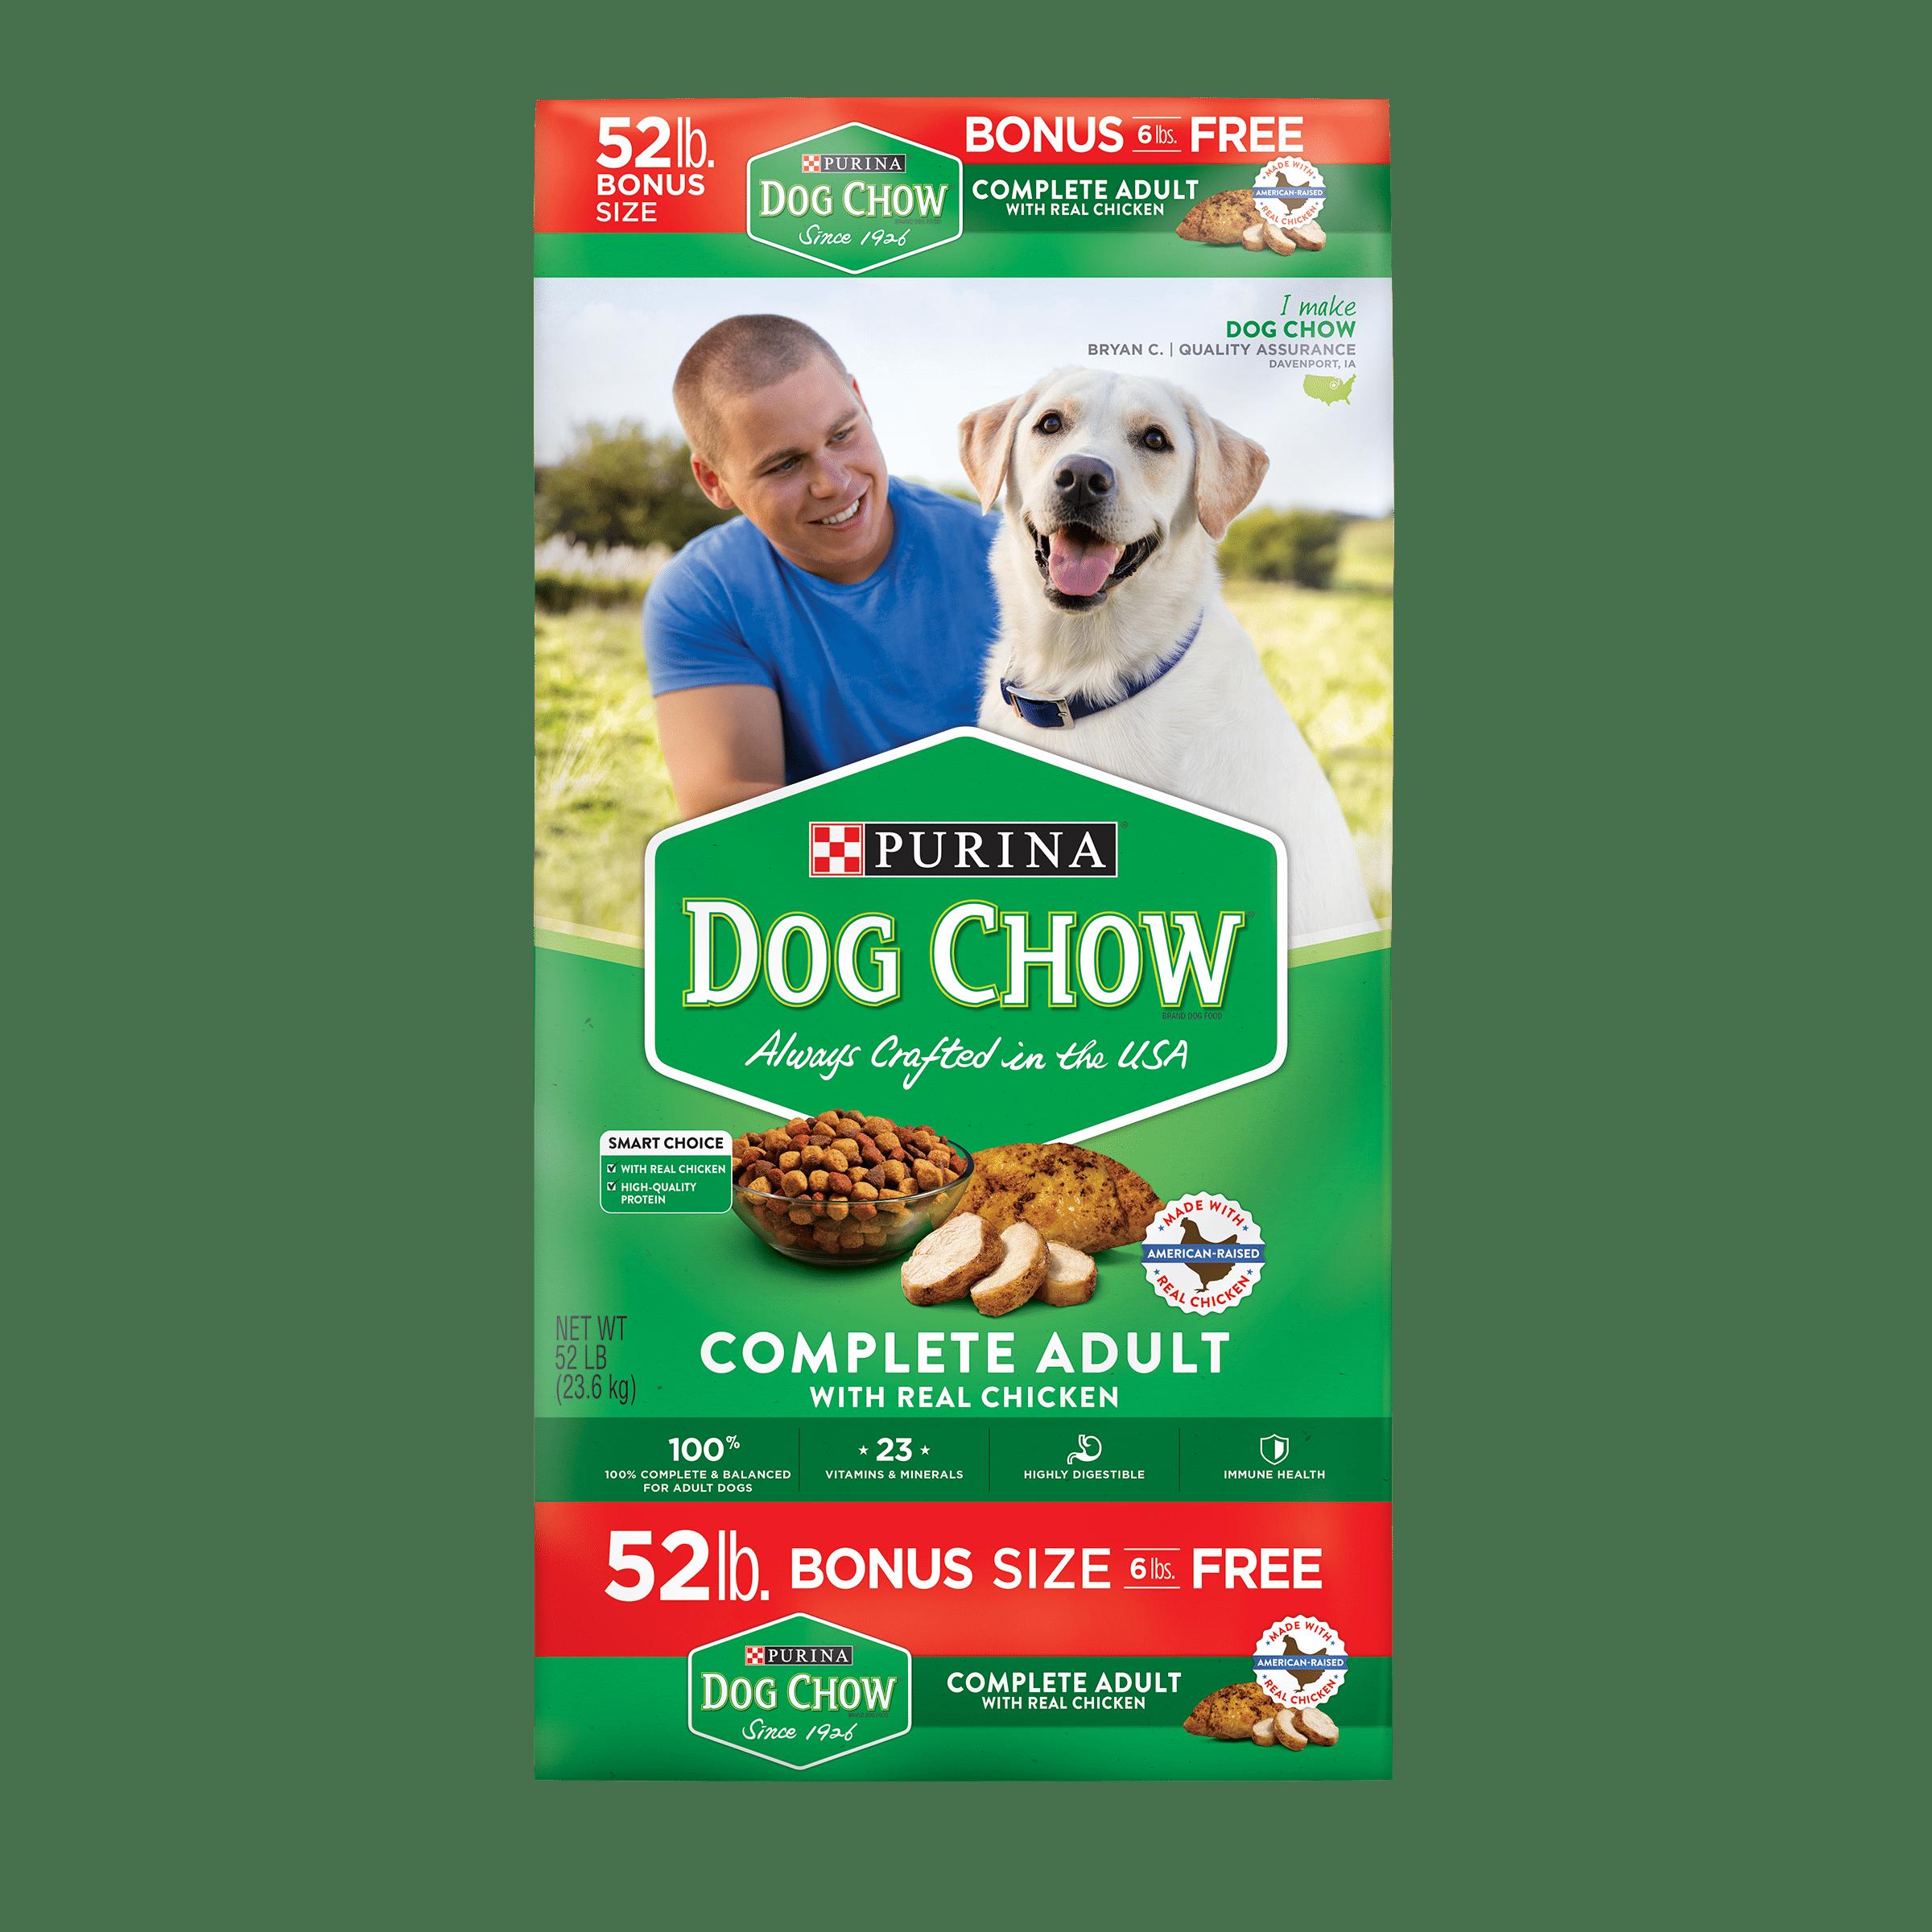 Purina Dog Chow Complete Adult Bonus Size Dry Dog Food, 52